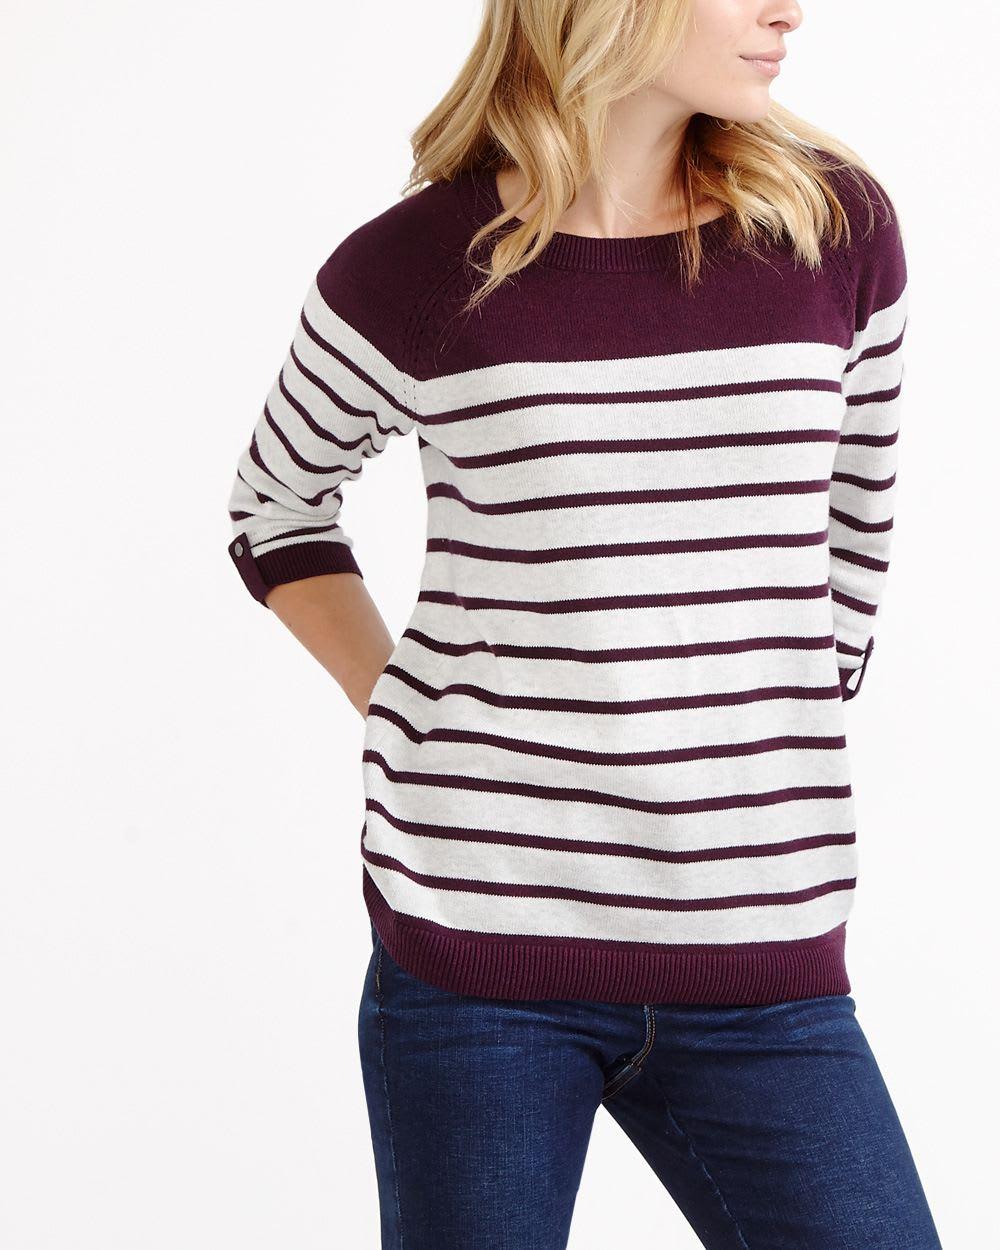 0f0643613b9 ¾ Sleeve Striped Sweater